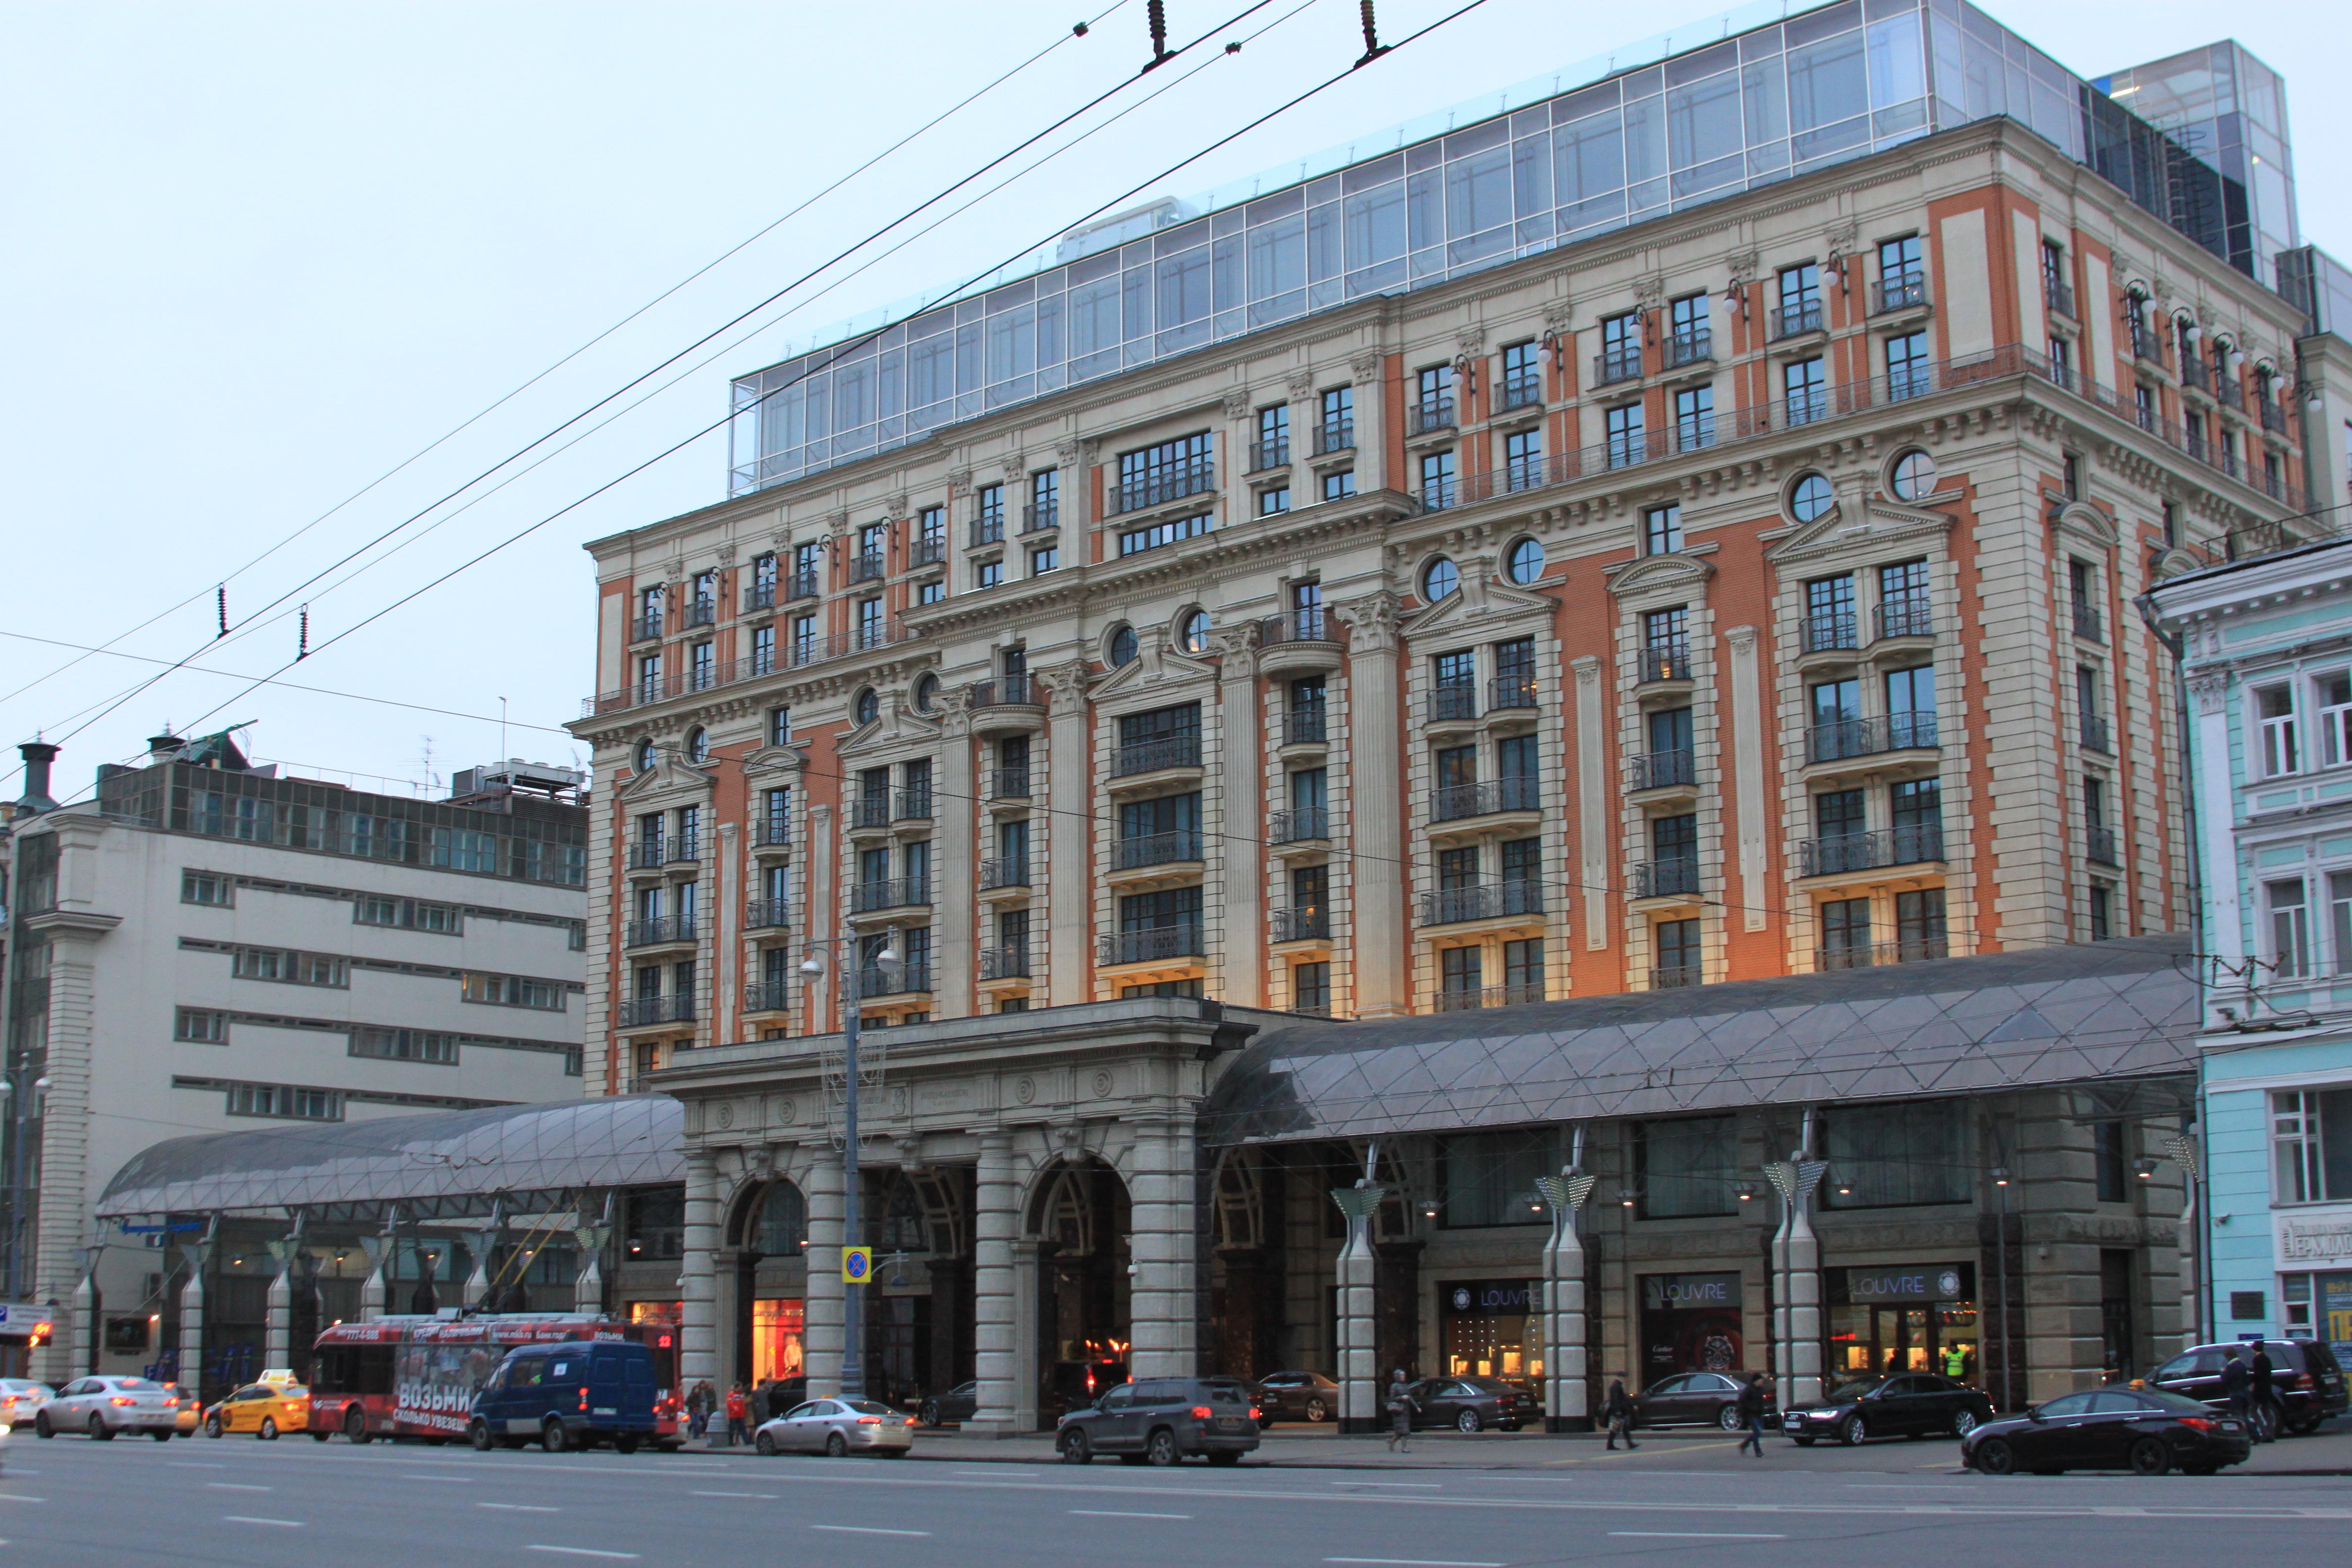 Total quality management at Ritz Carlton